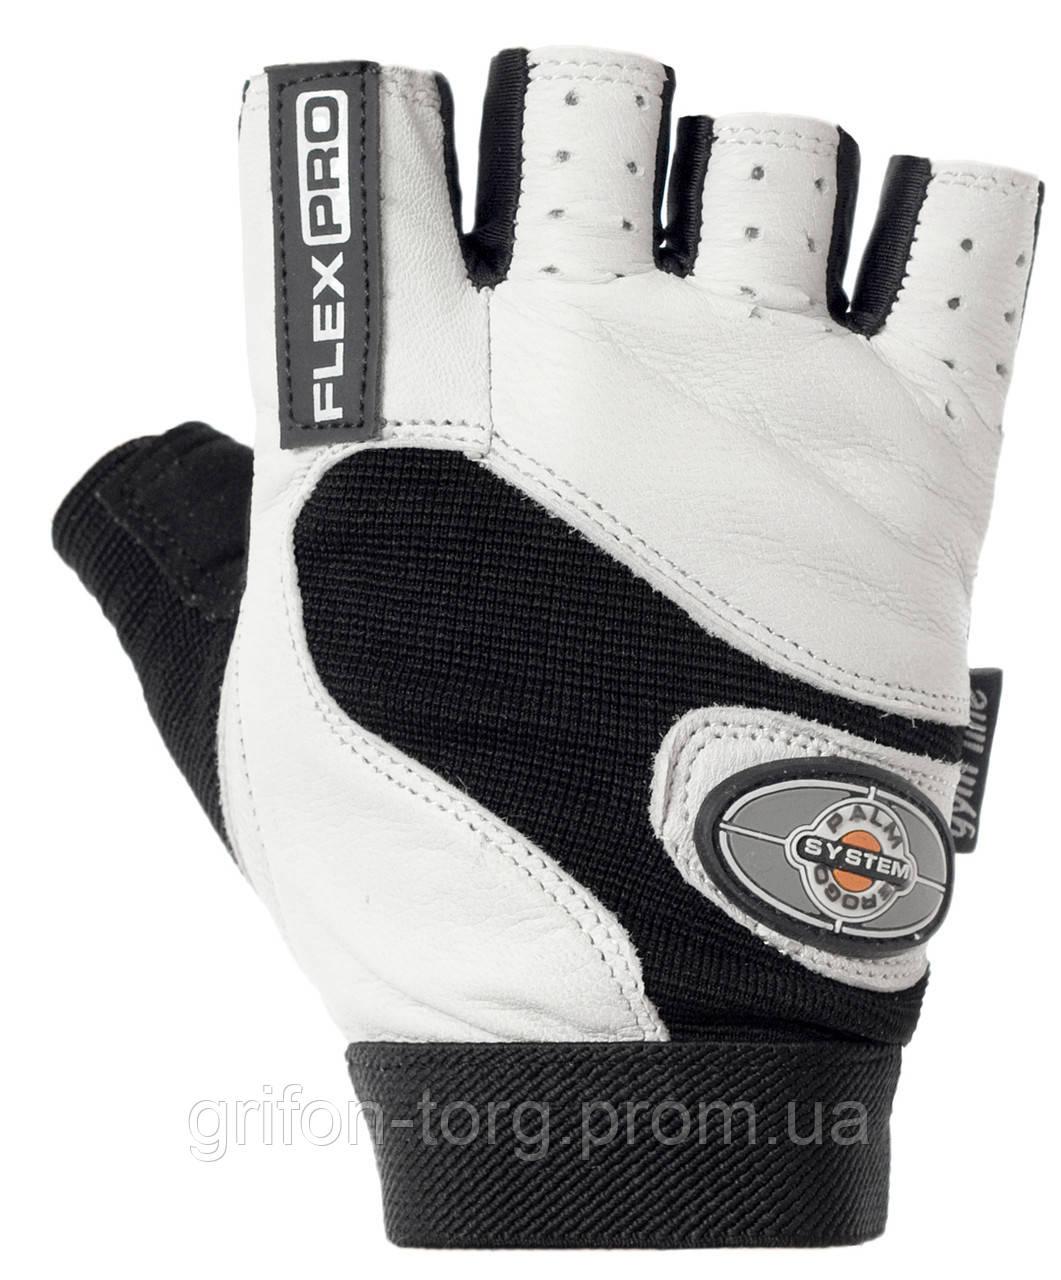 Перчатки для фитнеса и тяжелой атлетики Power System Flex Pro PS-2650 XS White